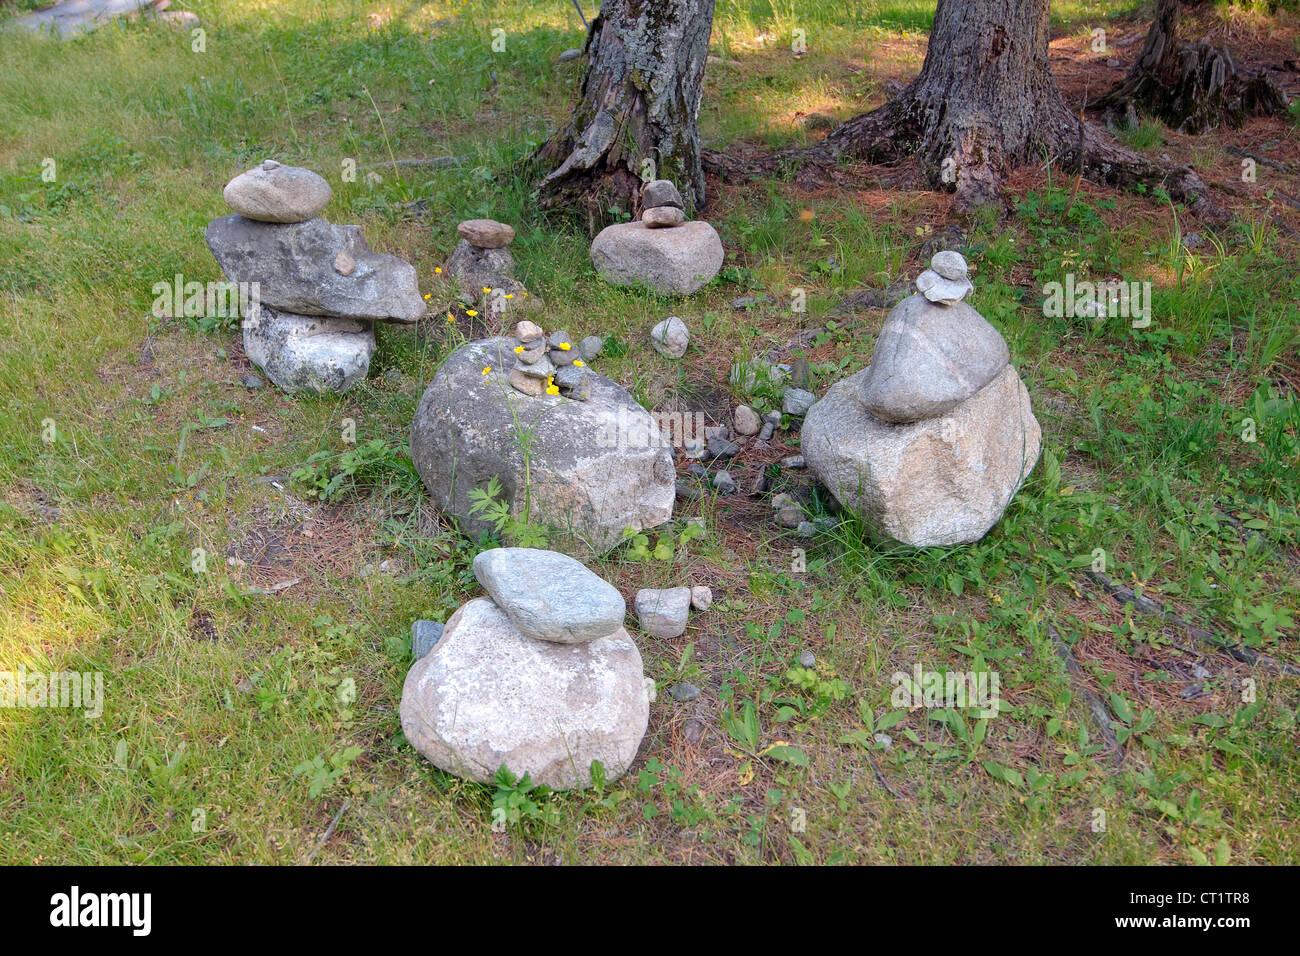 stones of fulfillment of desires, stone garden. Arshan, Tunkinsky District, Republic of Buryatia, Siberia, Russian - Stock Image